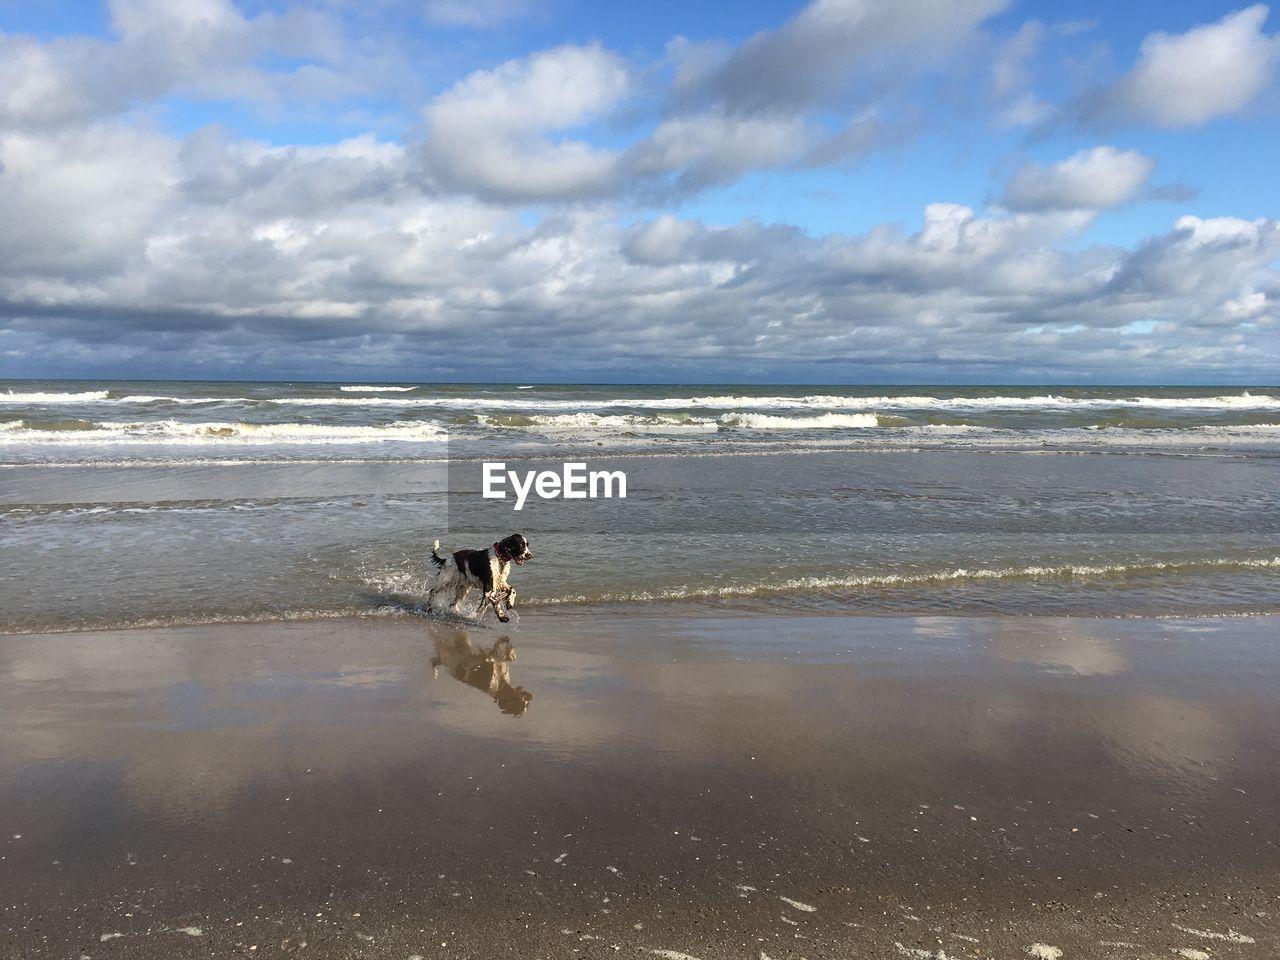 water, one animal, sea, cloud - sky, animal, animal themes, mammal, canine, sky, pets, dog, domestic animals, beach, domestic, land, horizon over water, vertebrate, beauty in nature, horizon, no people, outdoors